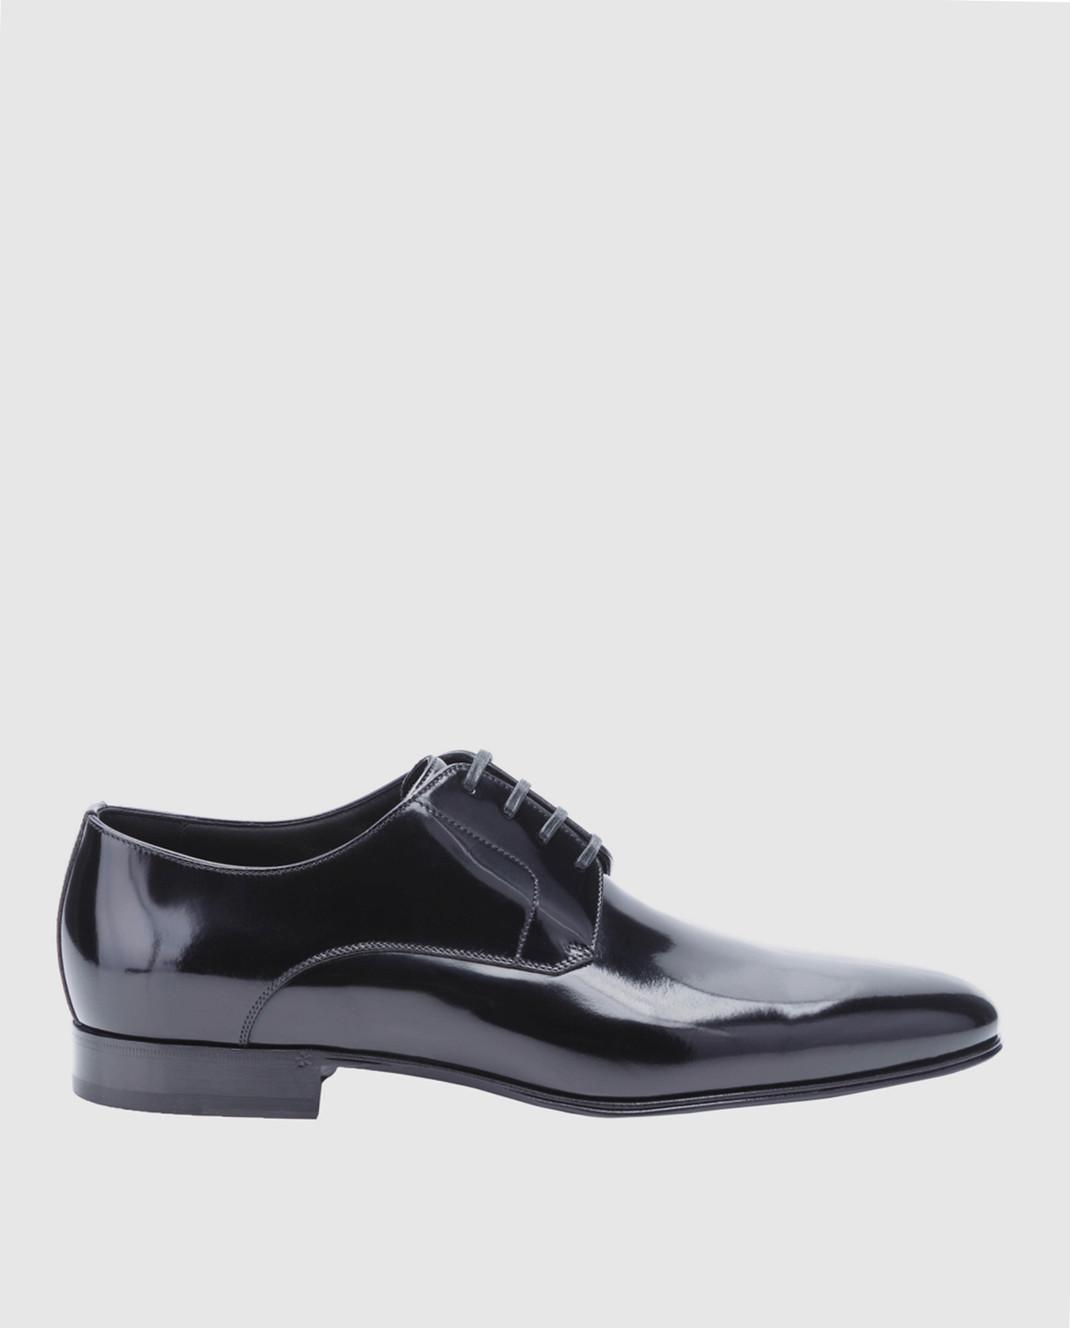 Dolce&Gabbana Черные кожаные дерби A10379A1203